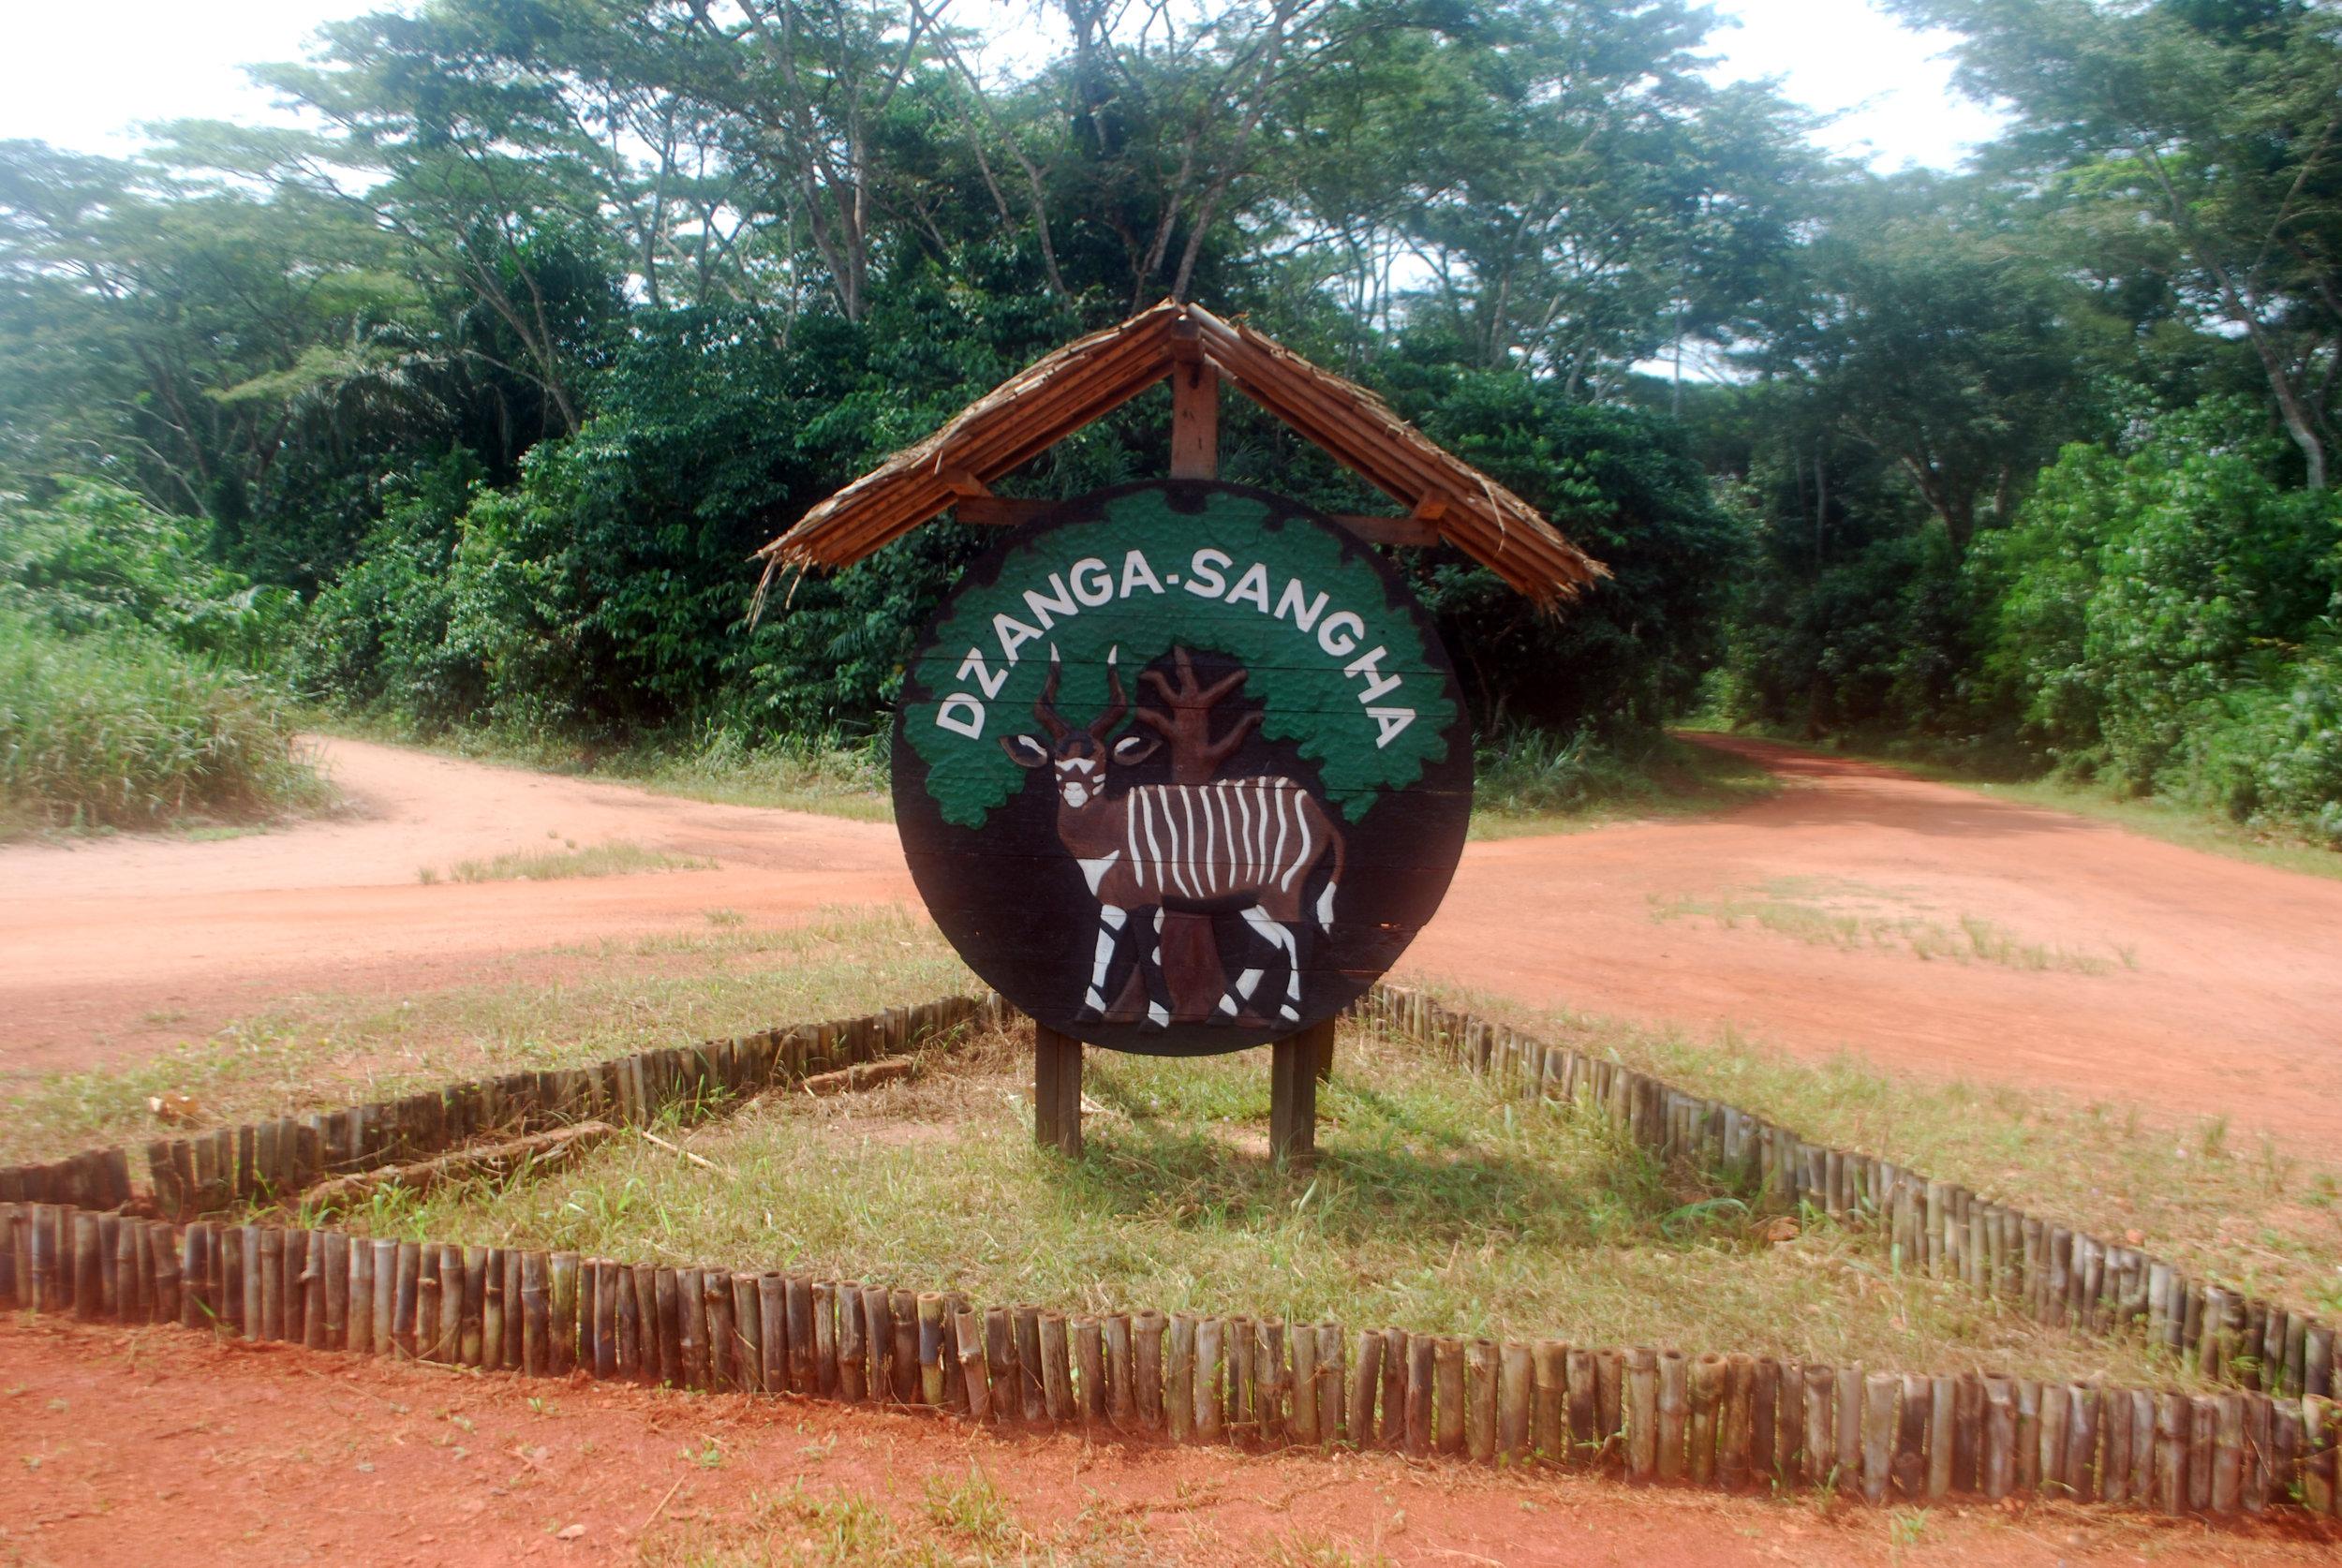 The entrance to Dzanga-Sangha National Park